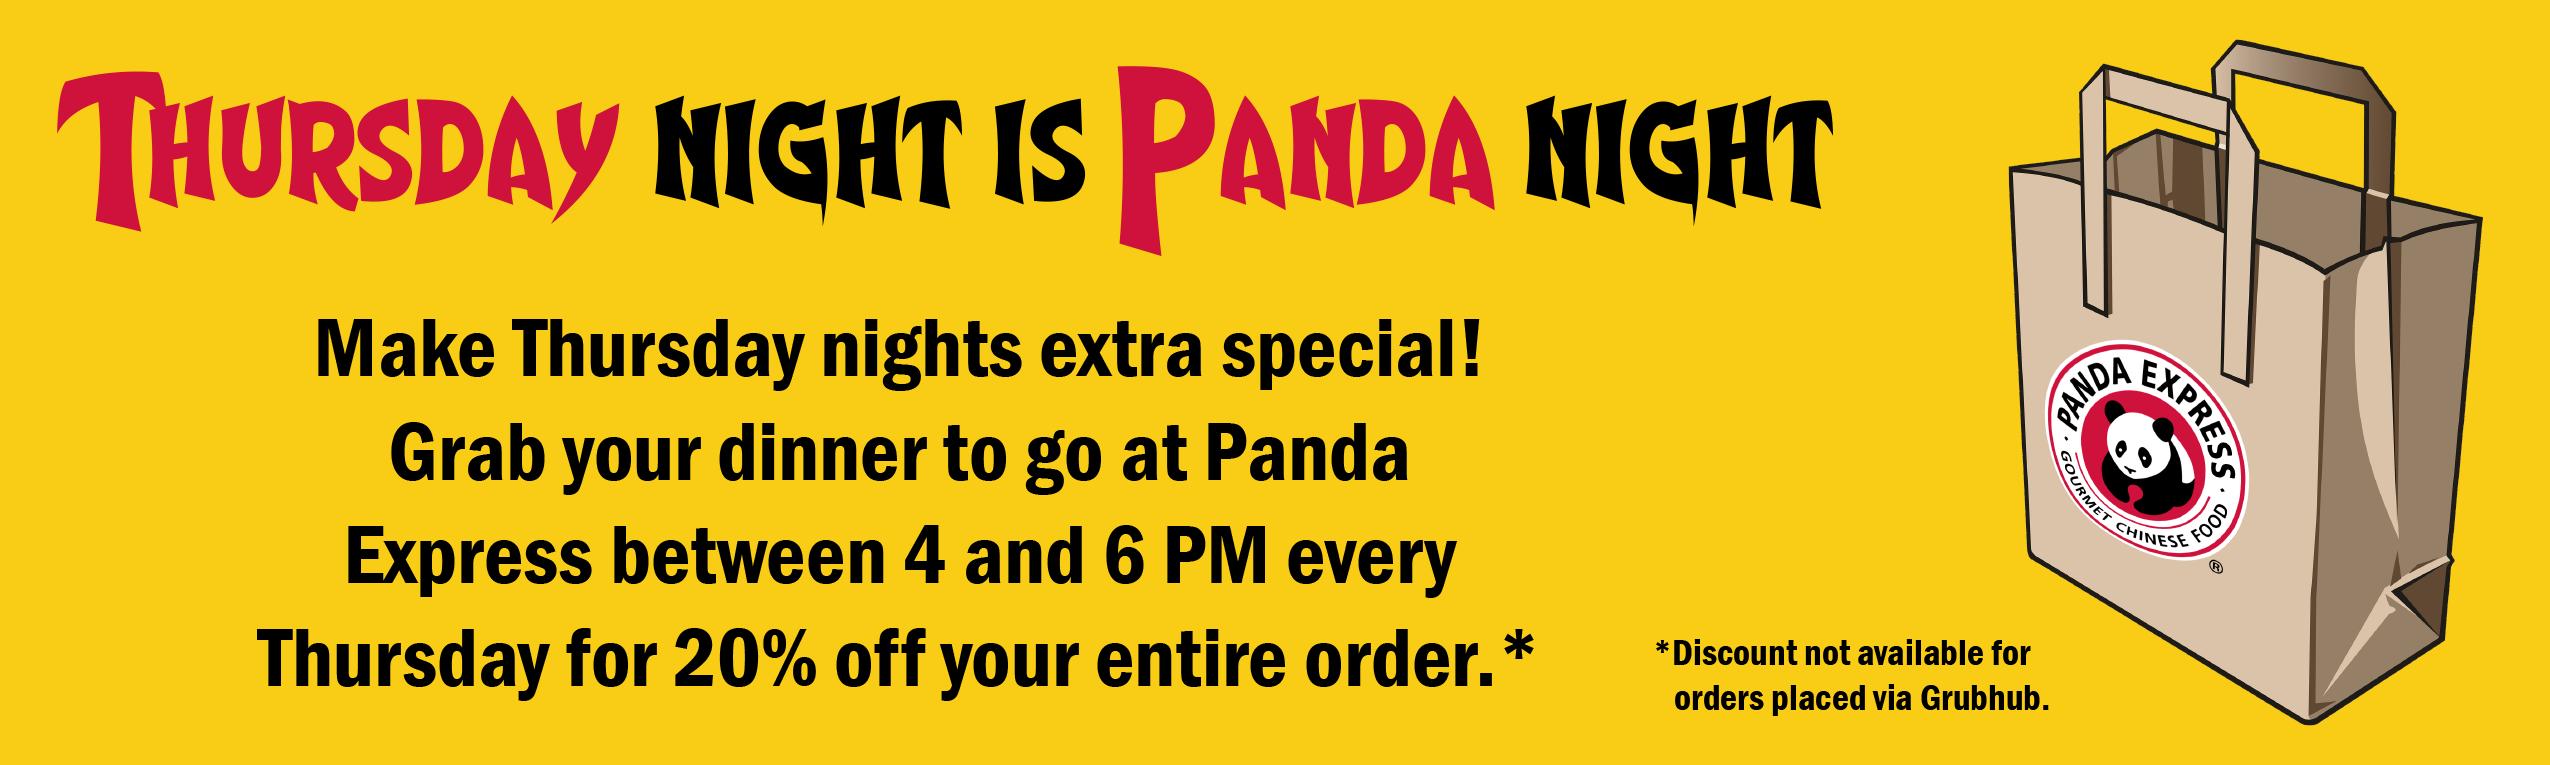 Thursday Night is Panda Night